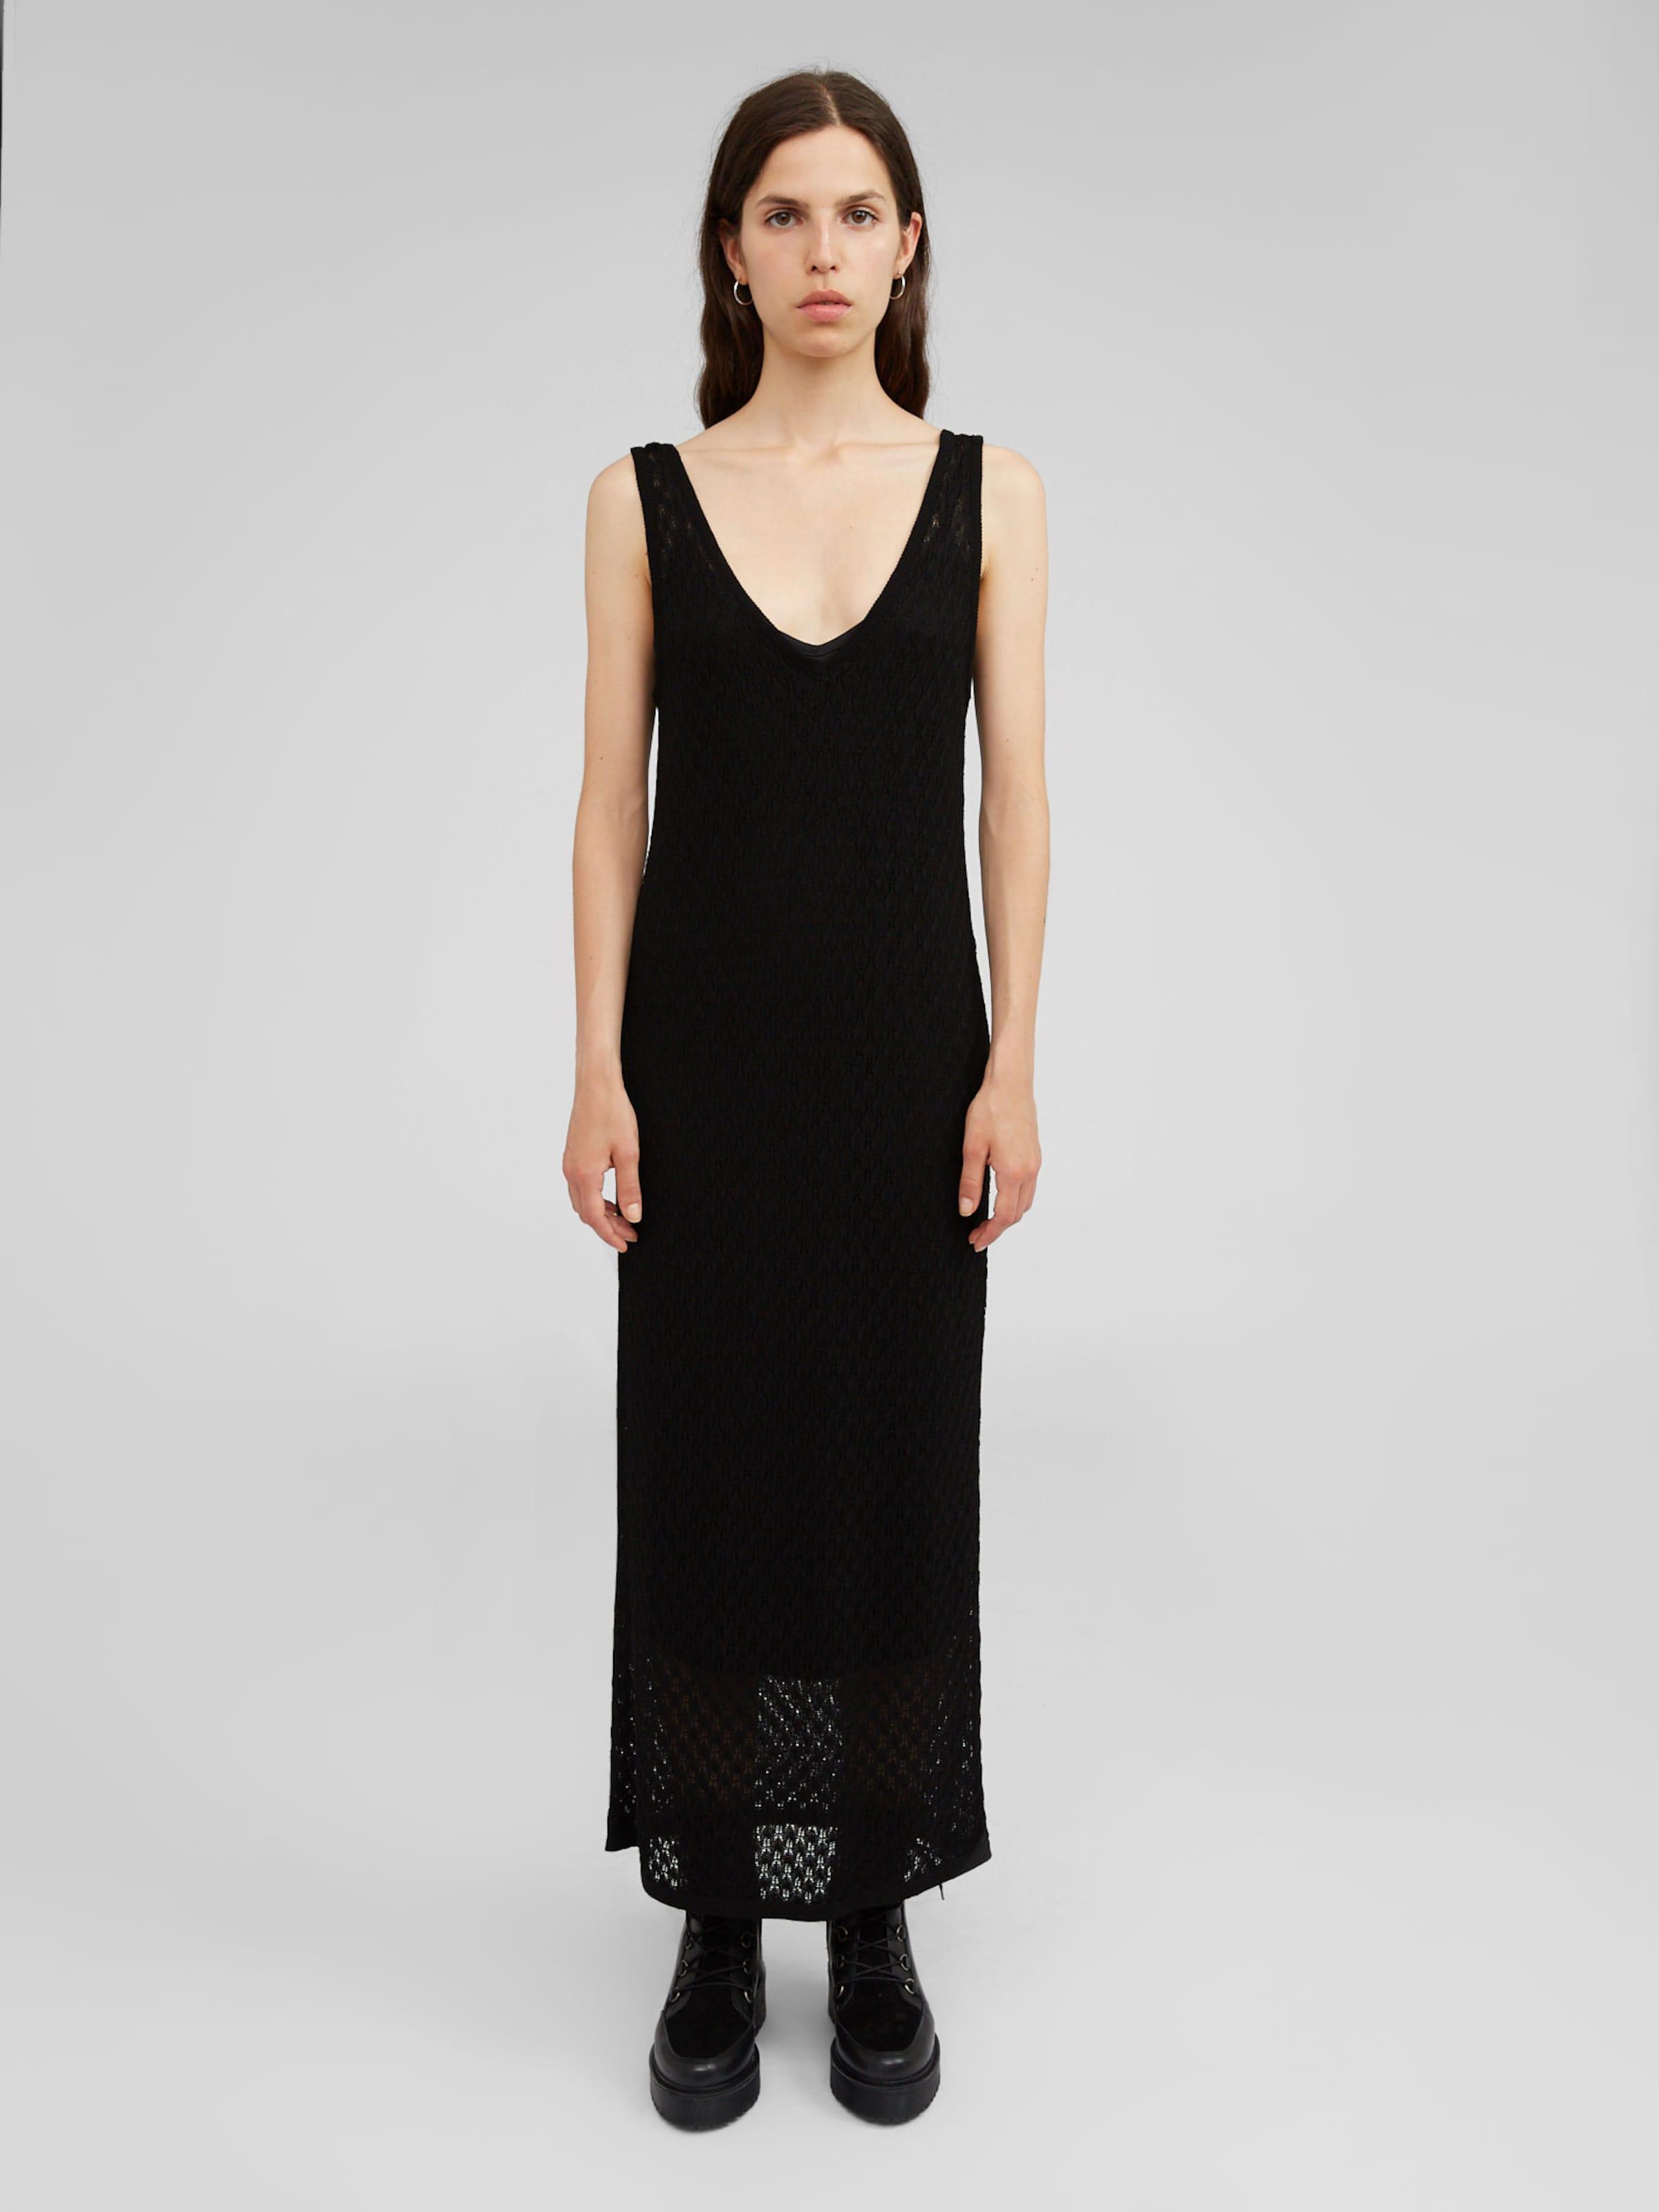 'pablo' Edited Edited Kleid Kleid Schwarz In 3A5jqc4RL